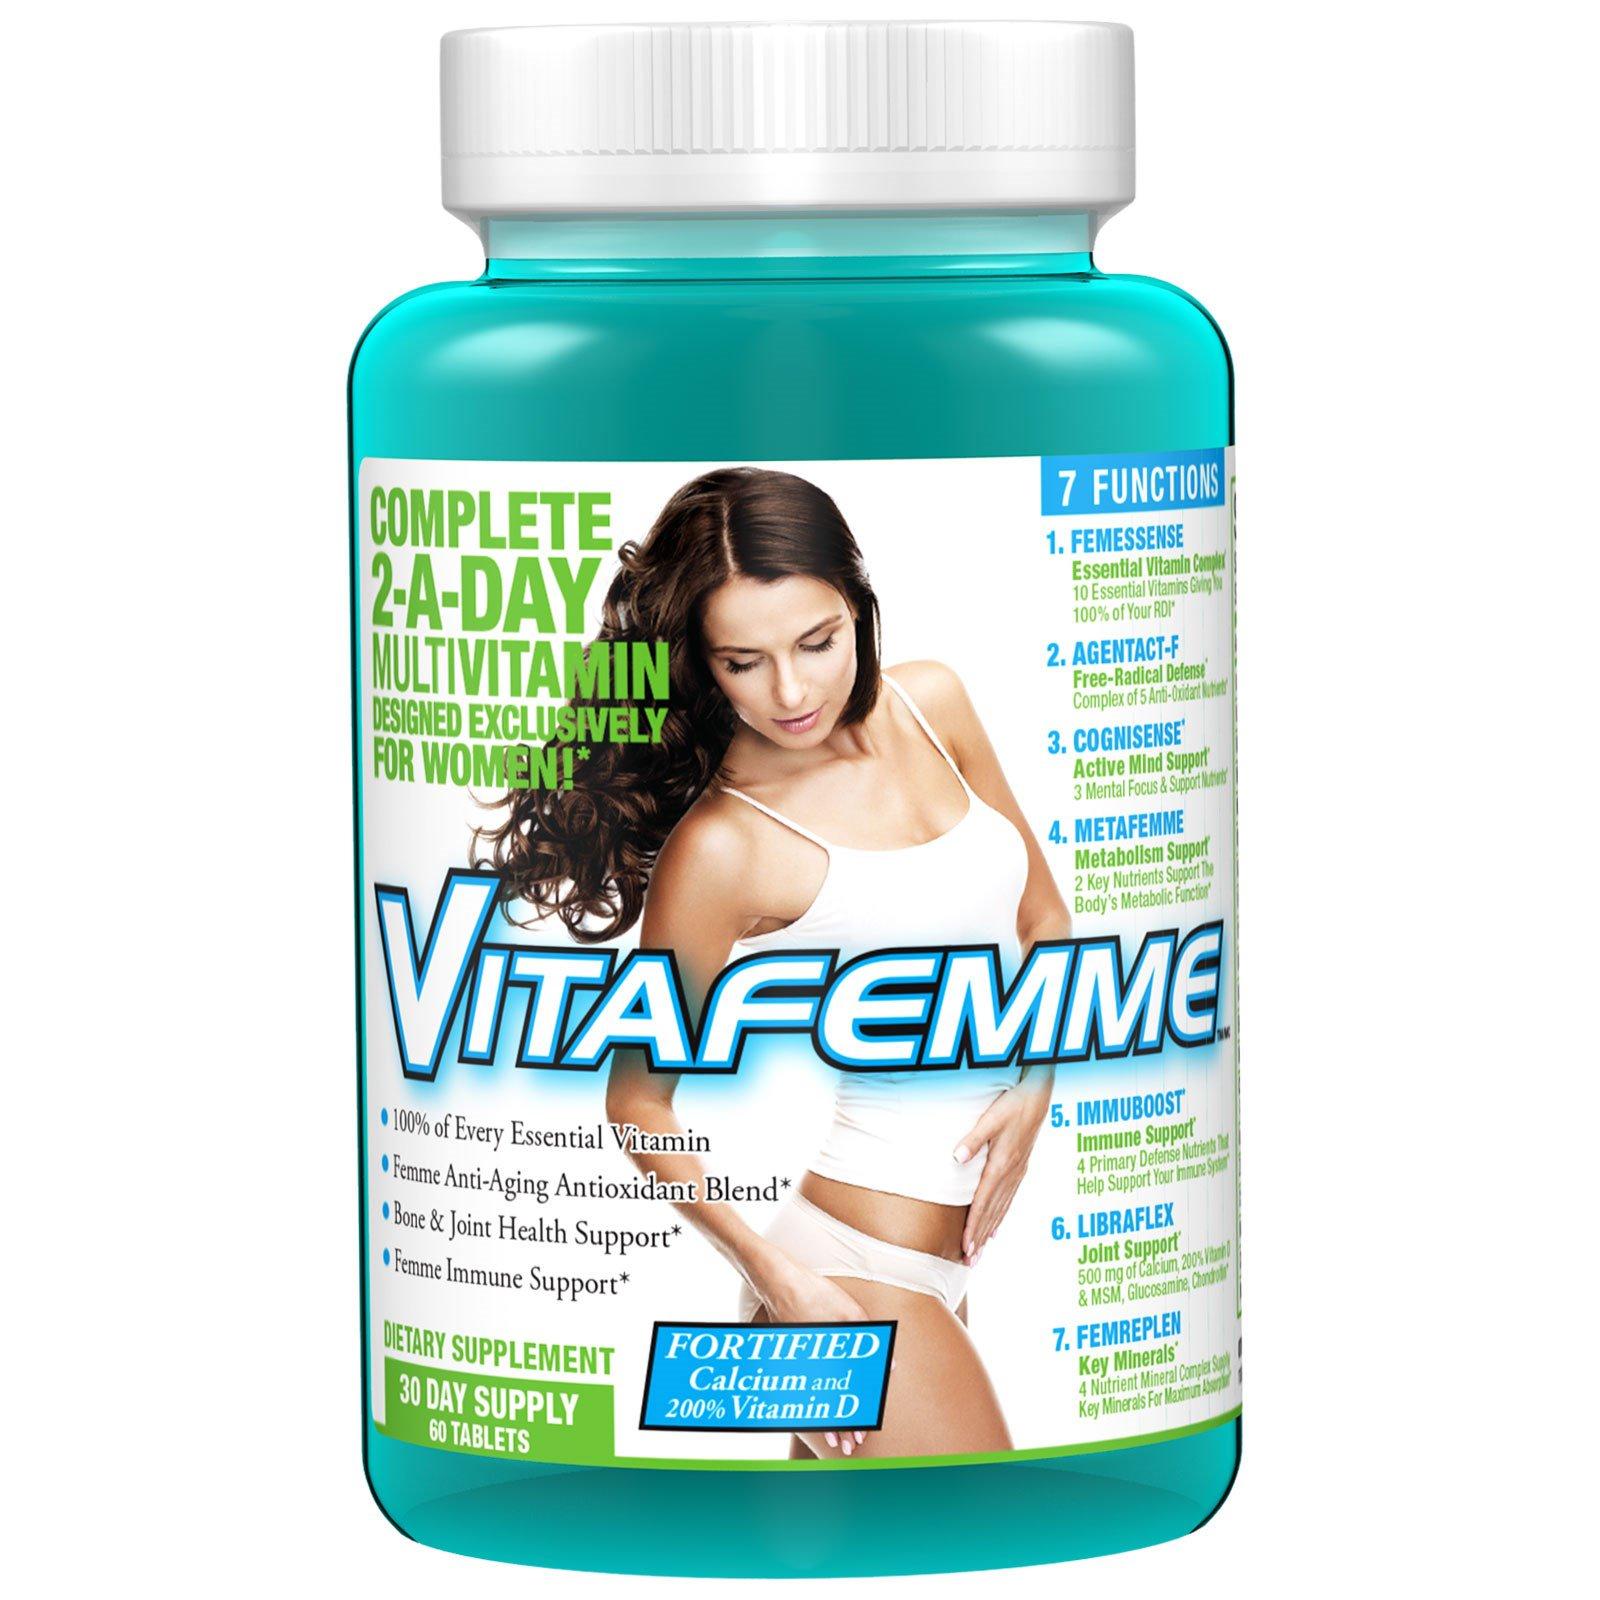 FEMME, Витафемм, поливитамины, 60 таблеток